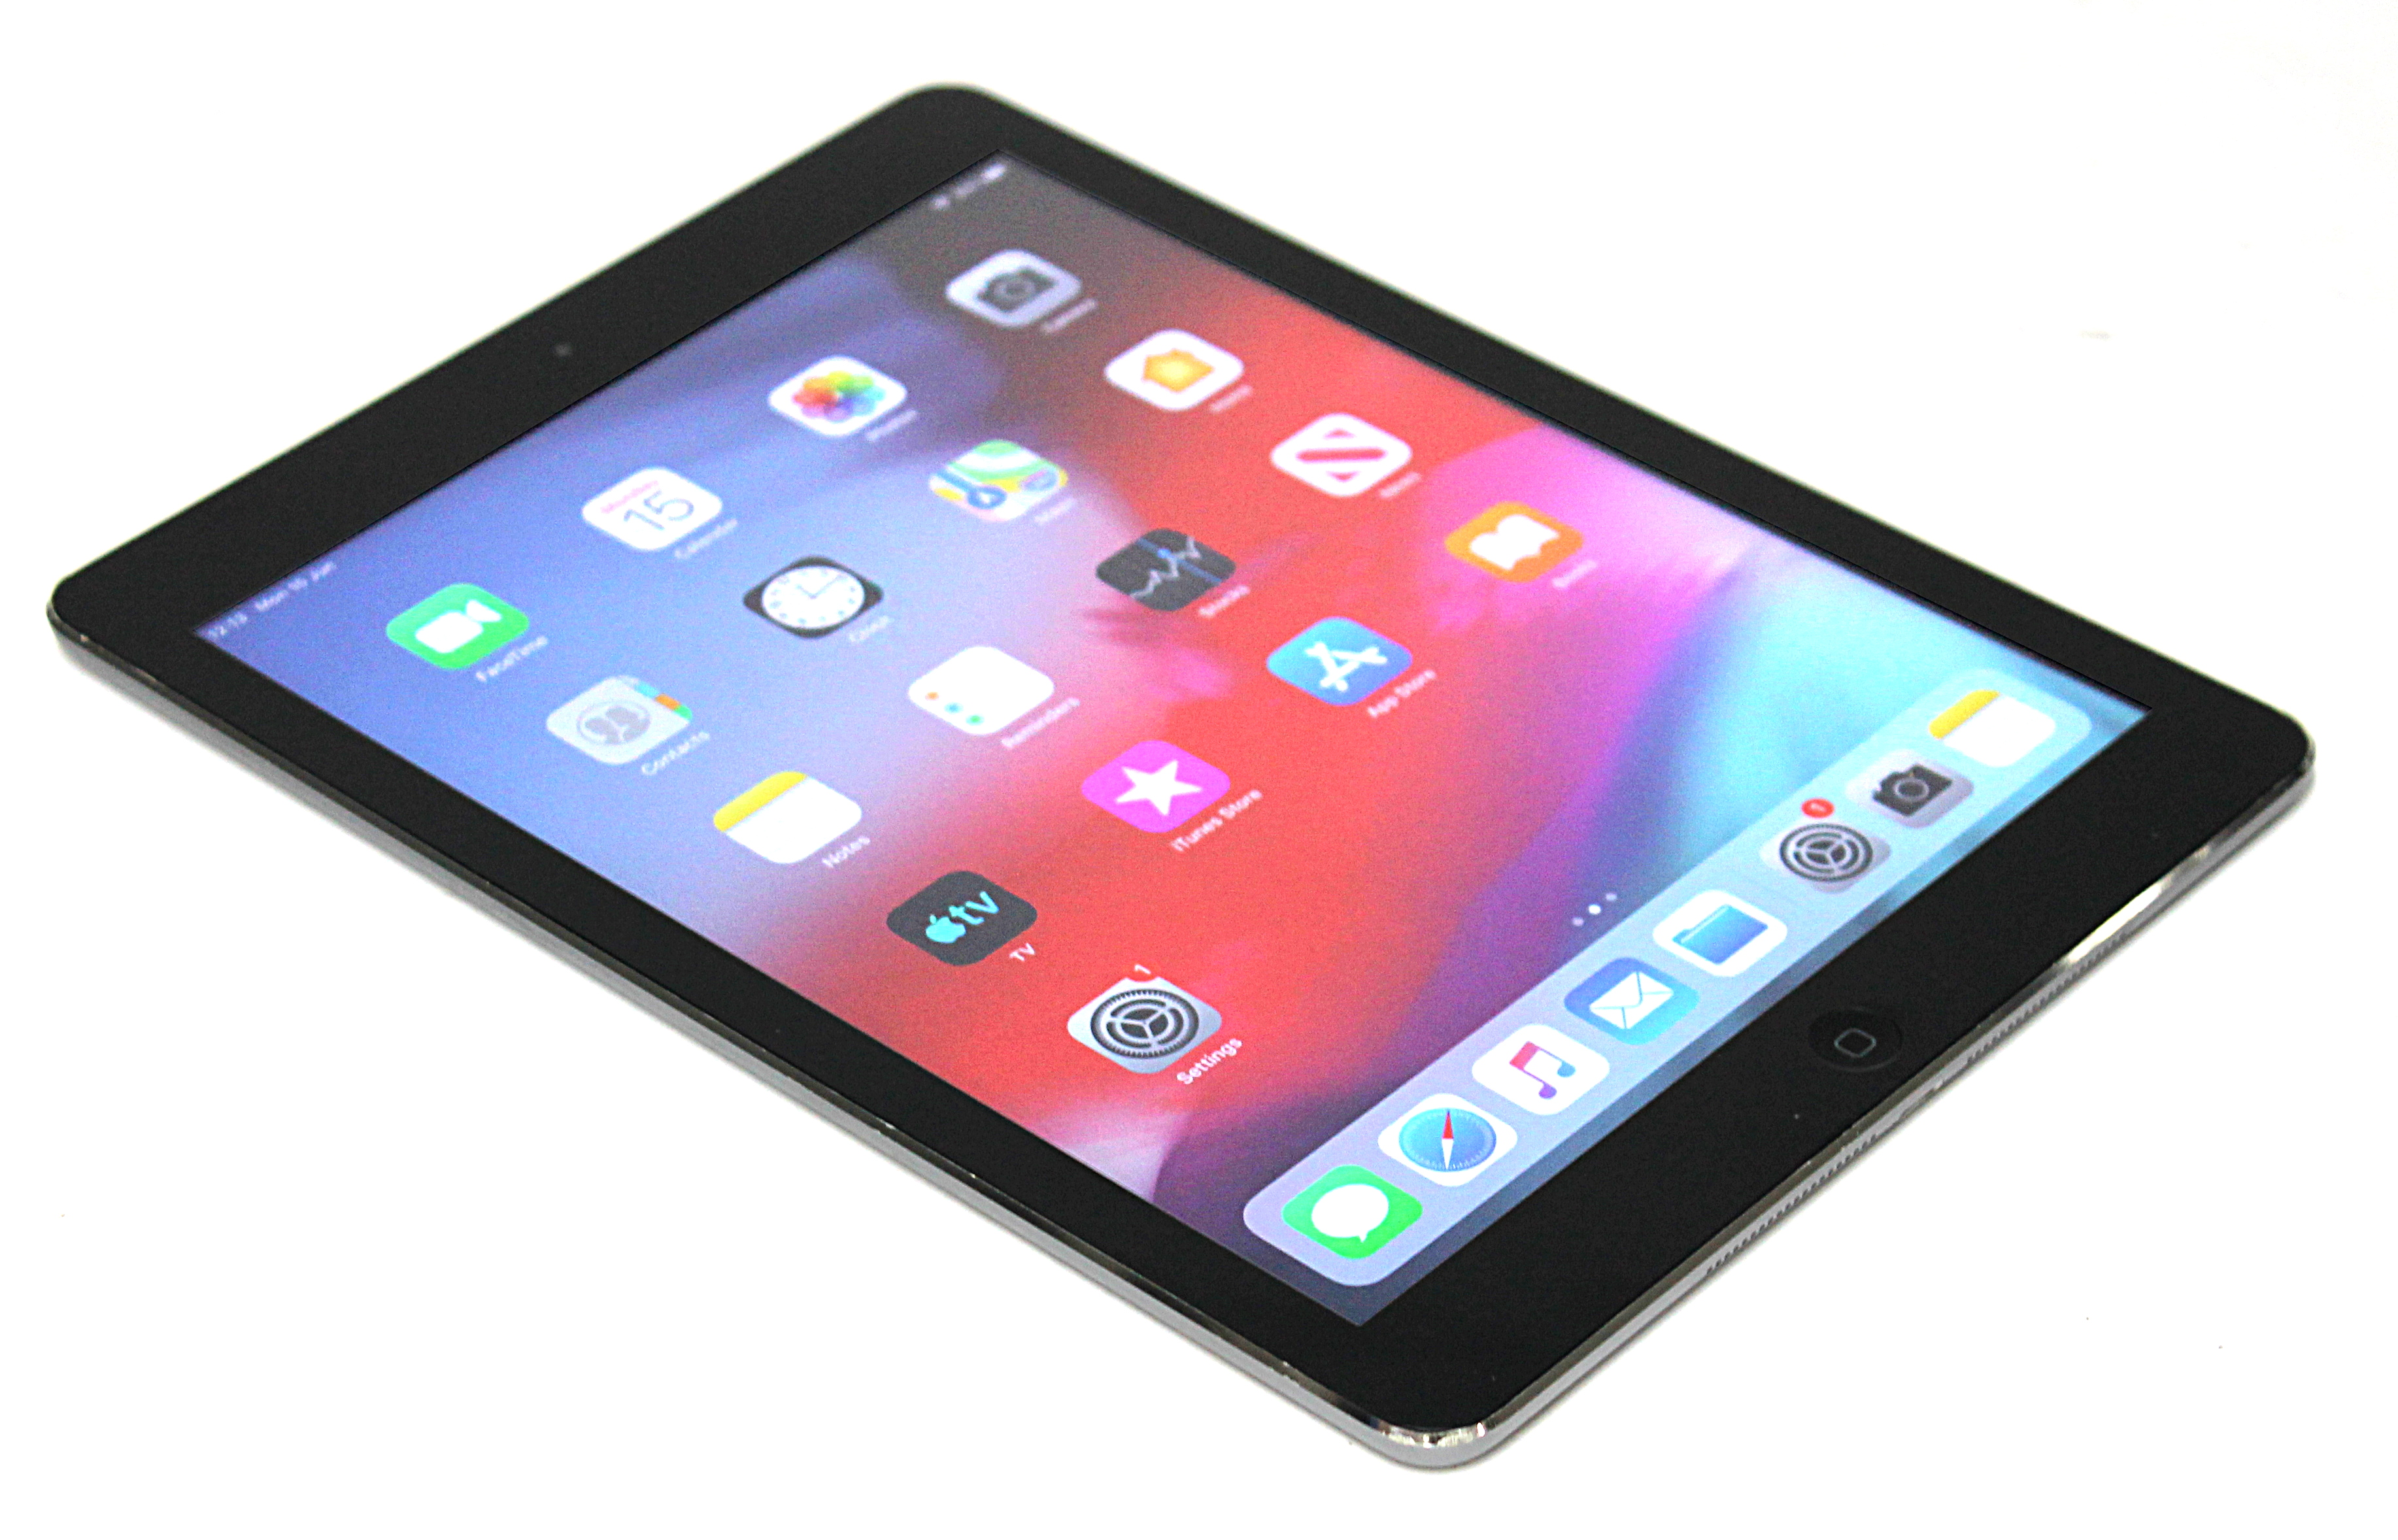 Apple iPad Air 1st Gen. A1474 - 32GB WiFi Space Grey Refurbished